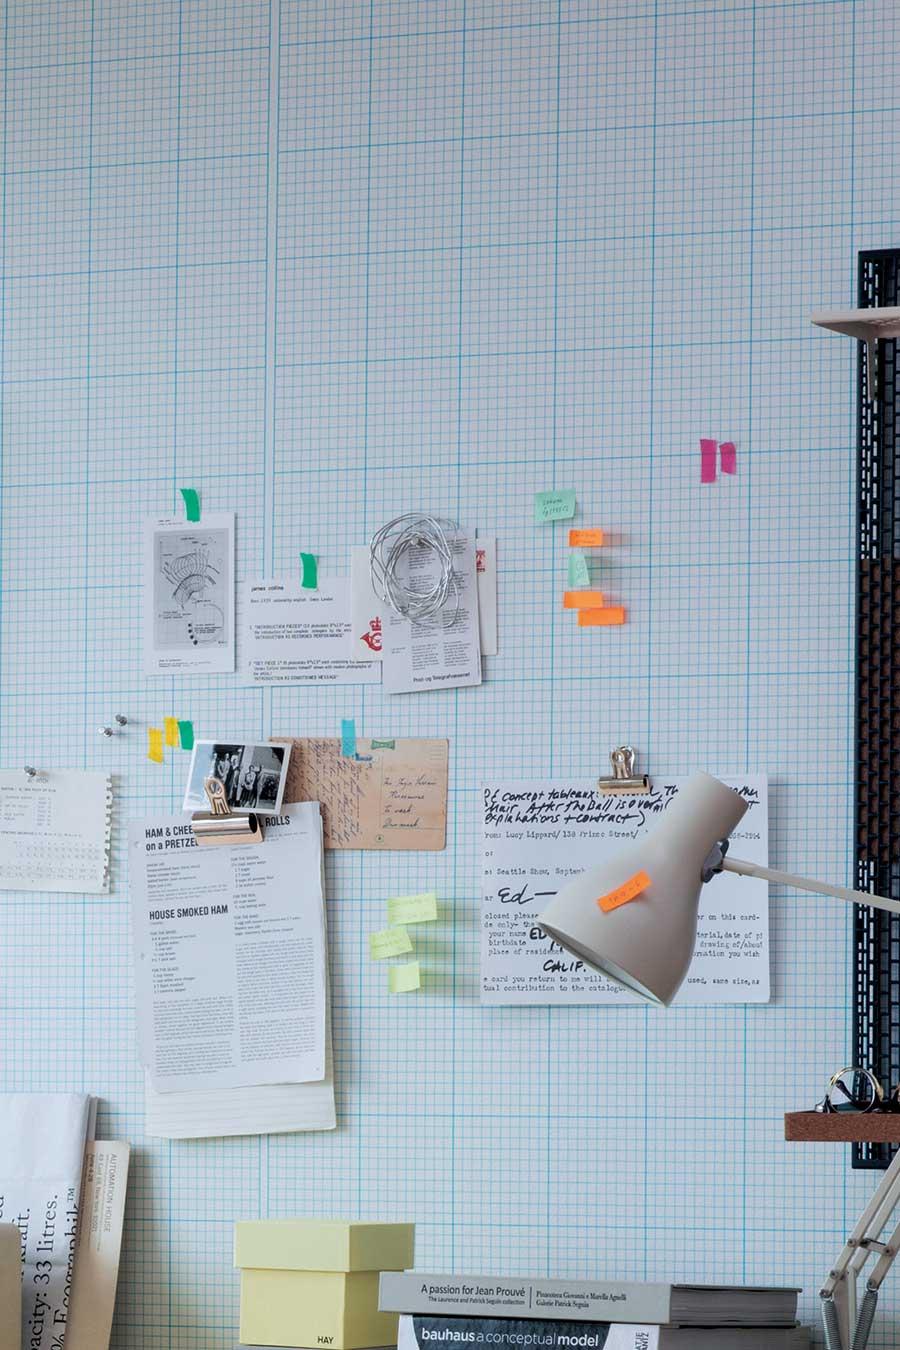 『SUPPOSE DESIGN OFFICE Co., Ltd.』のデザインした方眼クロス〈Graph Paper〉。子ども部屋の壁にもピッタリ。子どもの背の高さを直接壁紙に書き込むのも楽しい。全2色。品番:TH-9339。©SUPPOSE DESIGN OFFICE Co.,Ltd. Photo by Norio Kidera, Styling by Fumiko Sakuhara